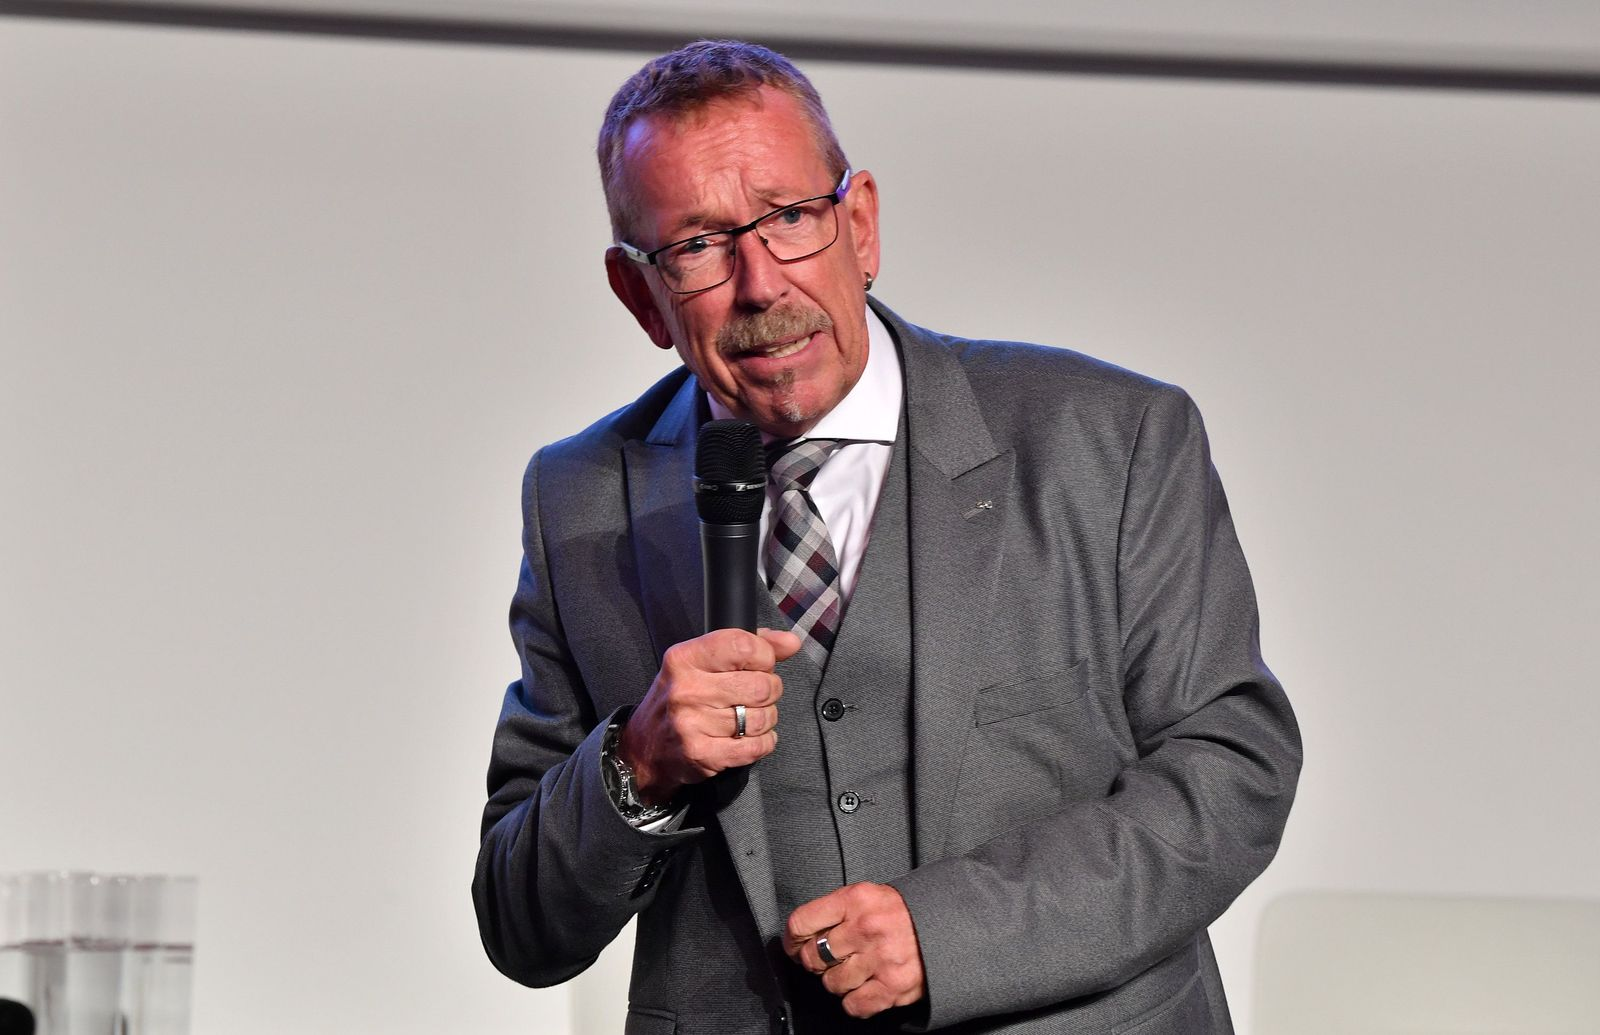 Karl-Heinz Brummer